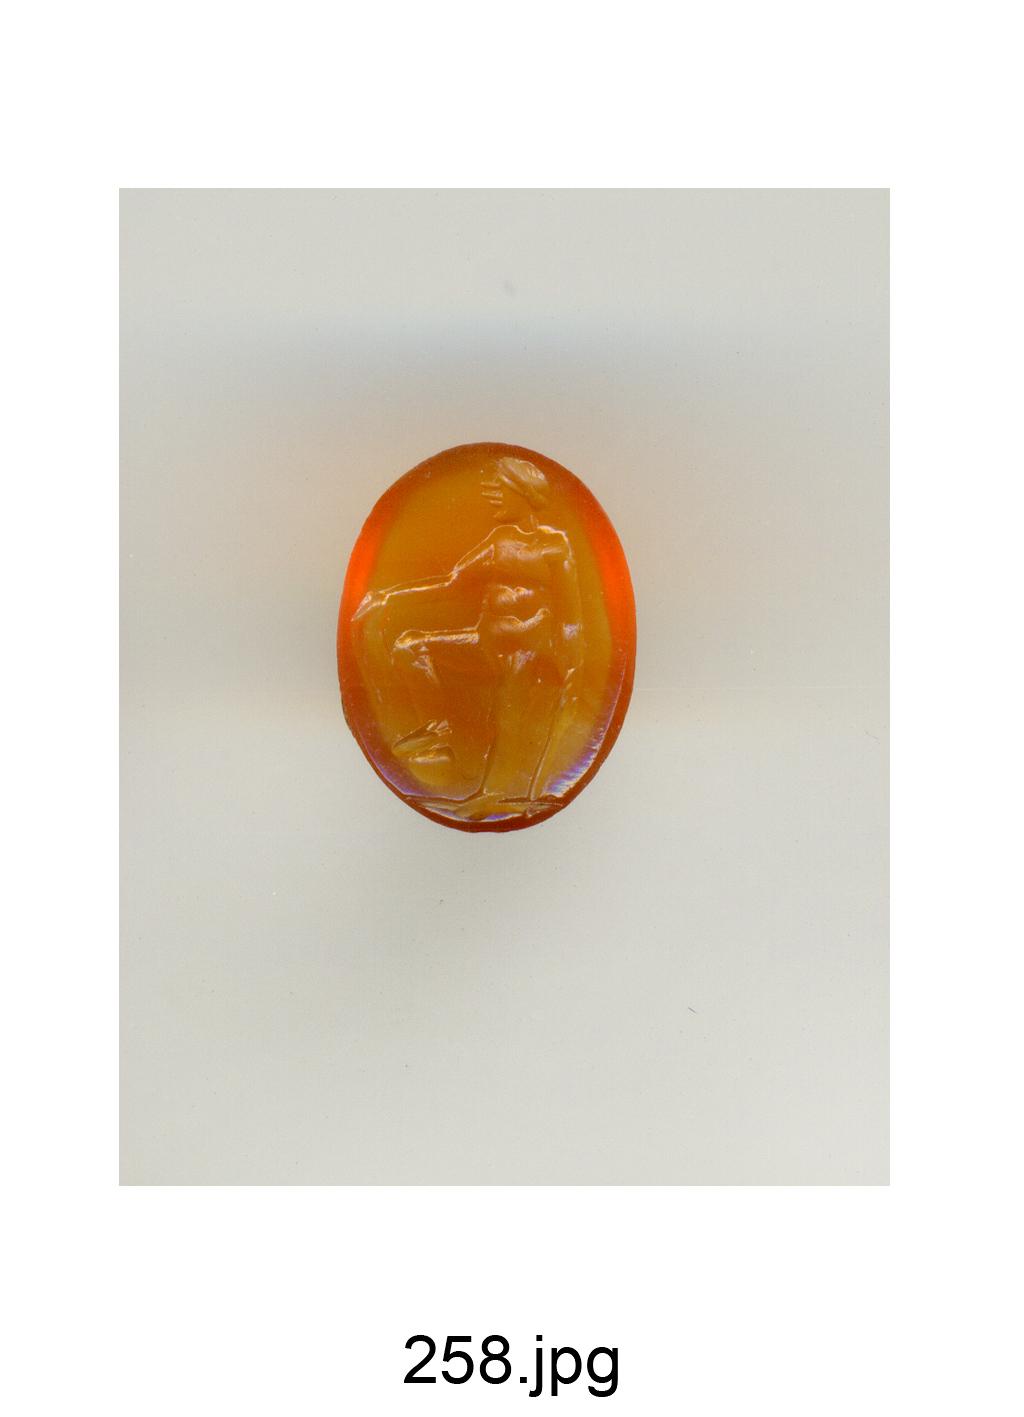 figura maschile nuda (gemma) - produzione italiana (secc. XVI/ XVII)